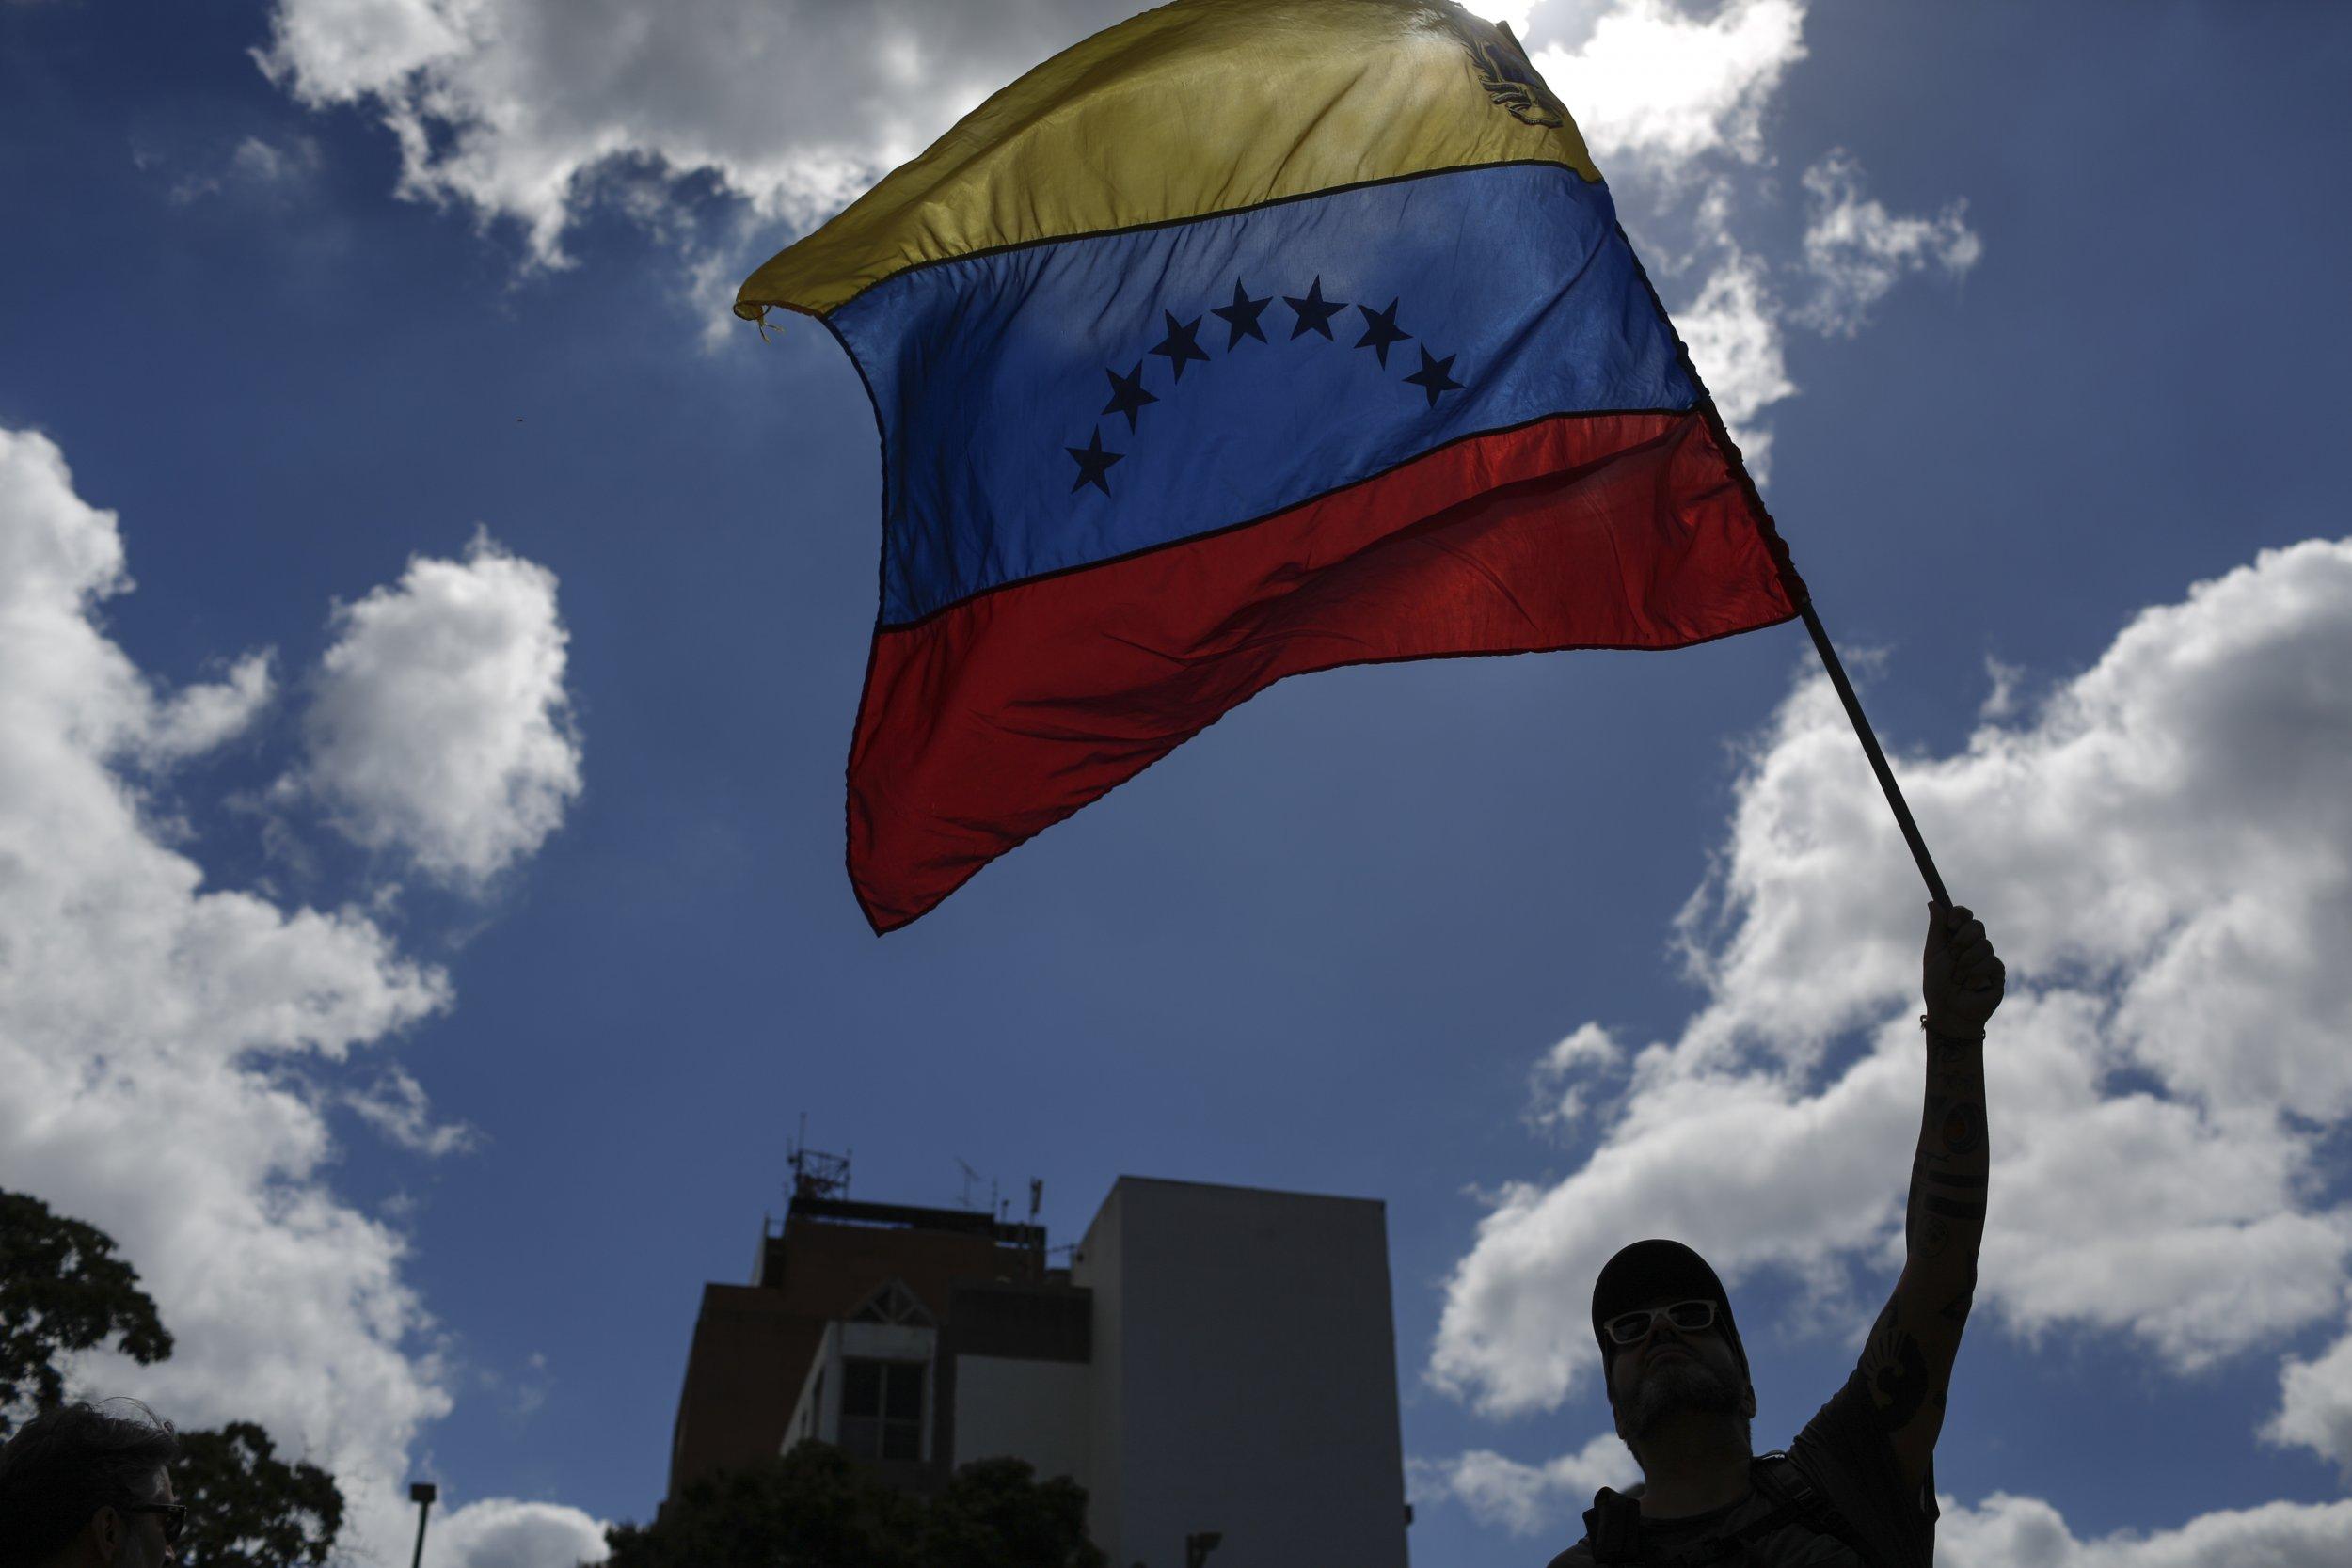 Venezuela flag Nicolas Maduro Donald Trump